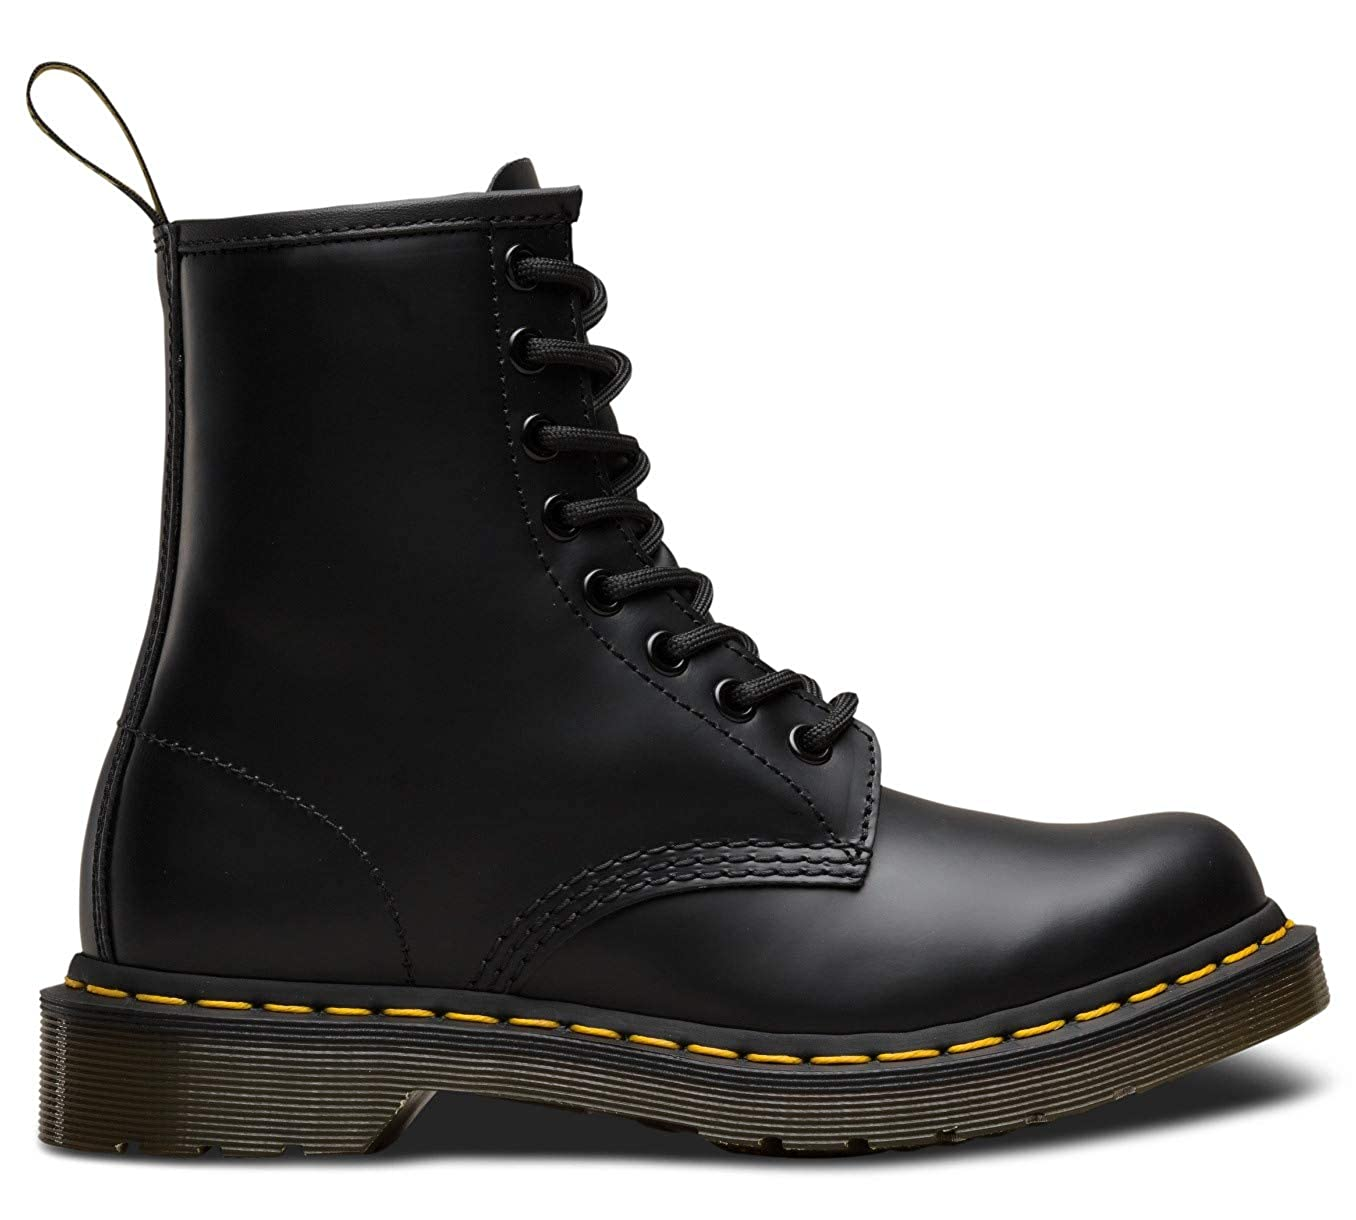 popular design best website dependable performance Dr. Martens - Women's 1460 Original 8-Eye Leather Boot, Black Smooth, 9 US  Women